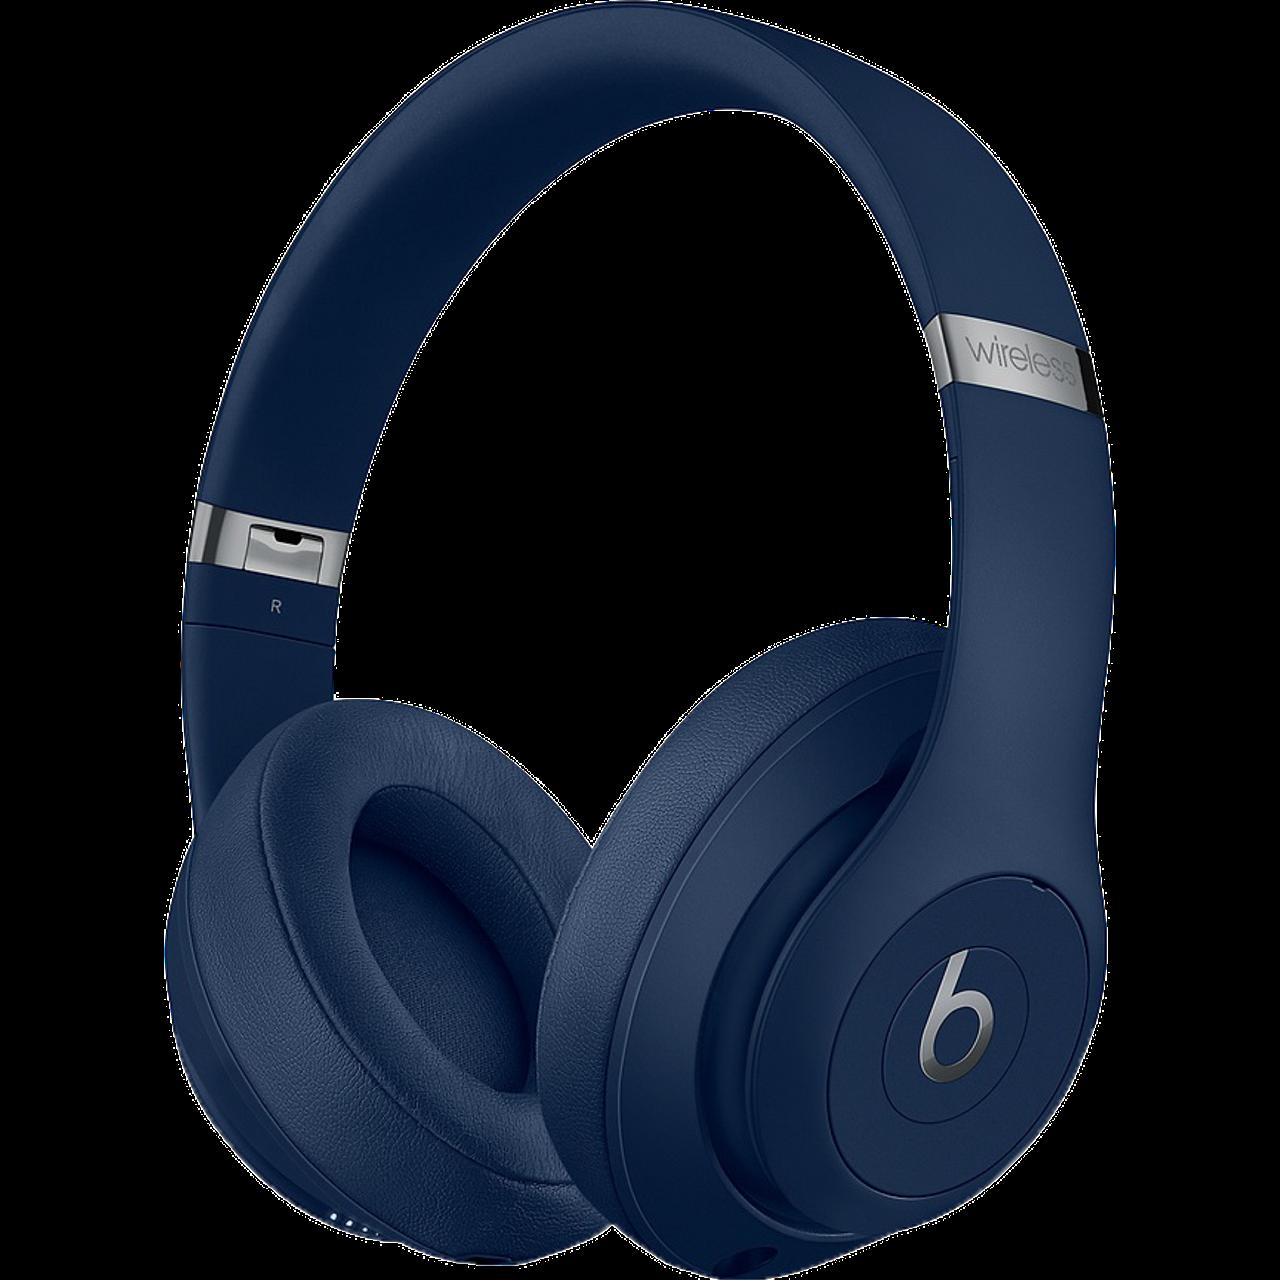 Beats Studio3 Over-Ear Wireless Bluetooth Headphones - Blue